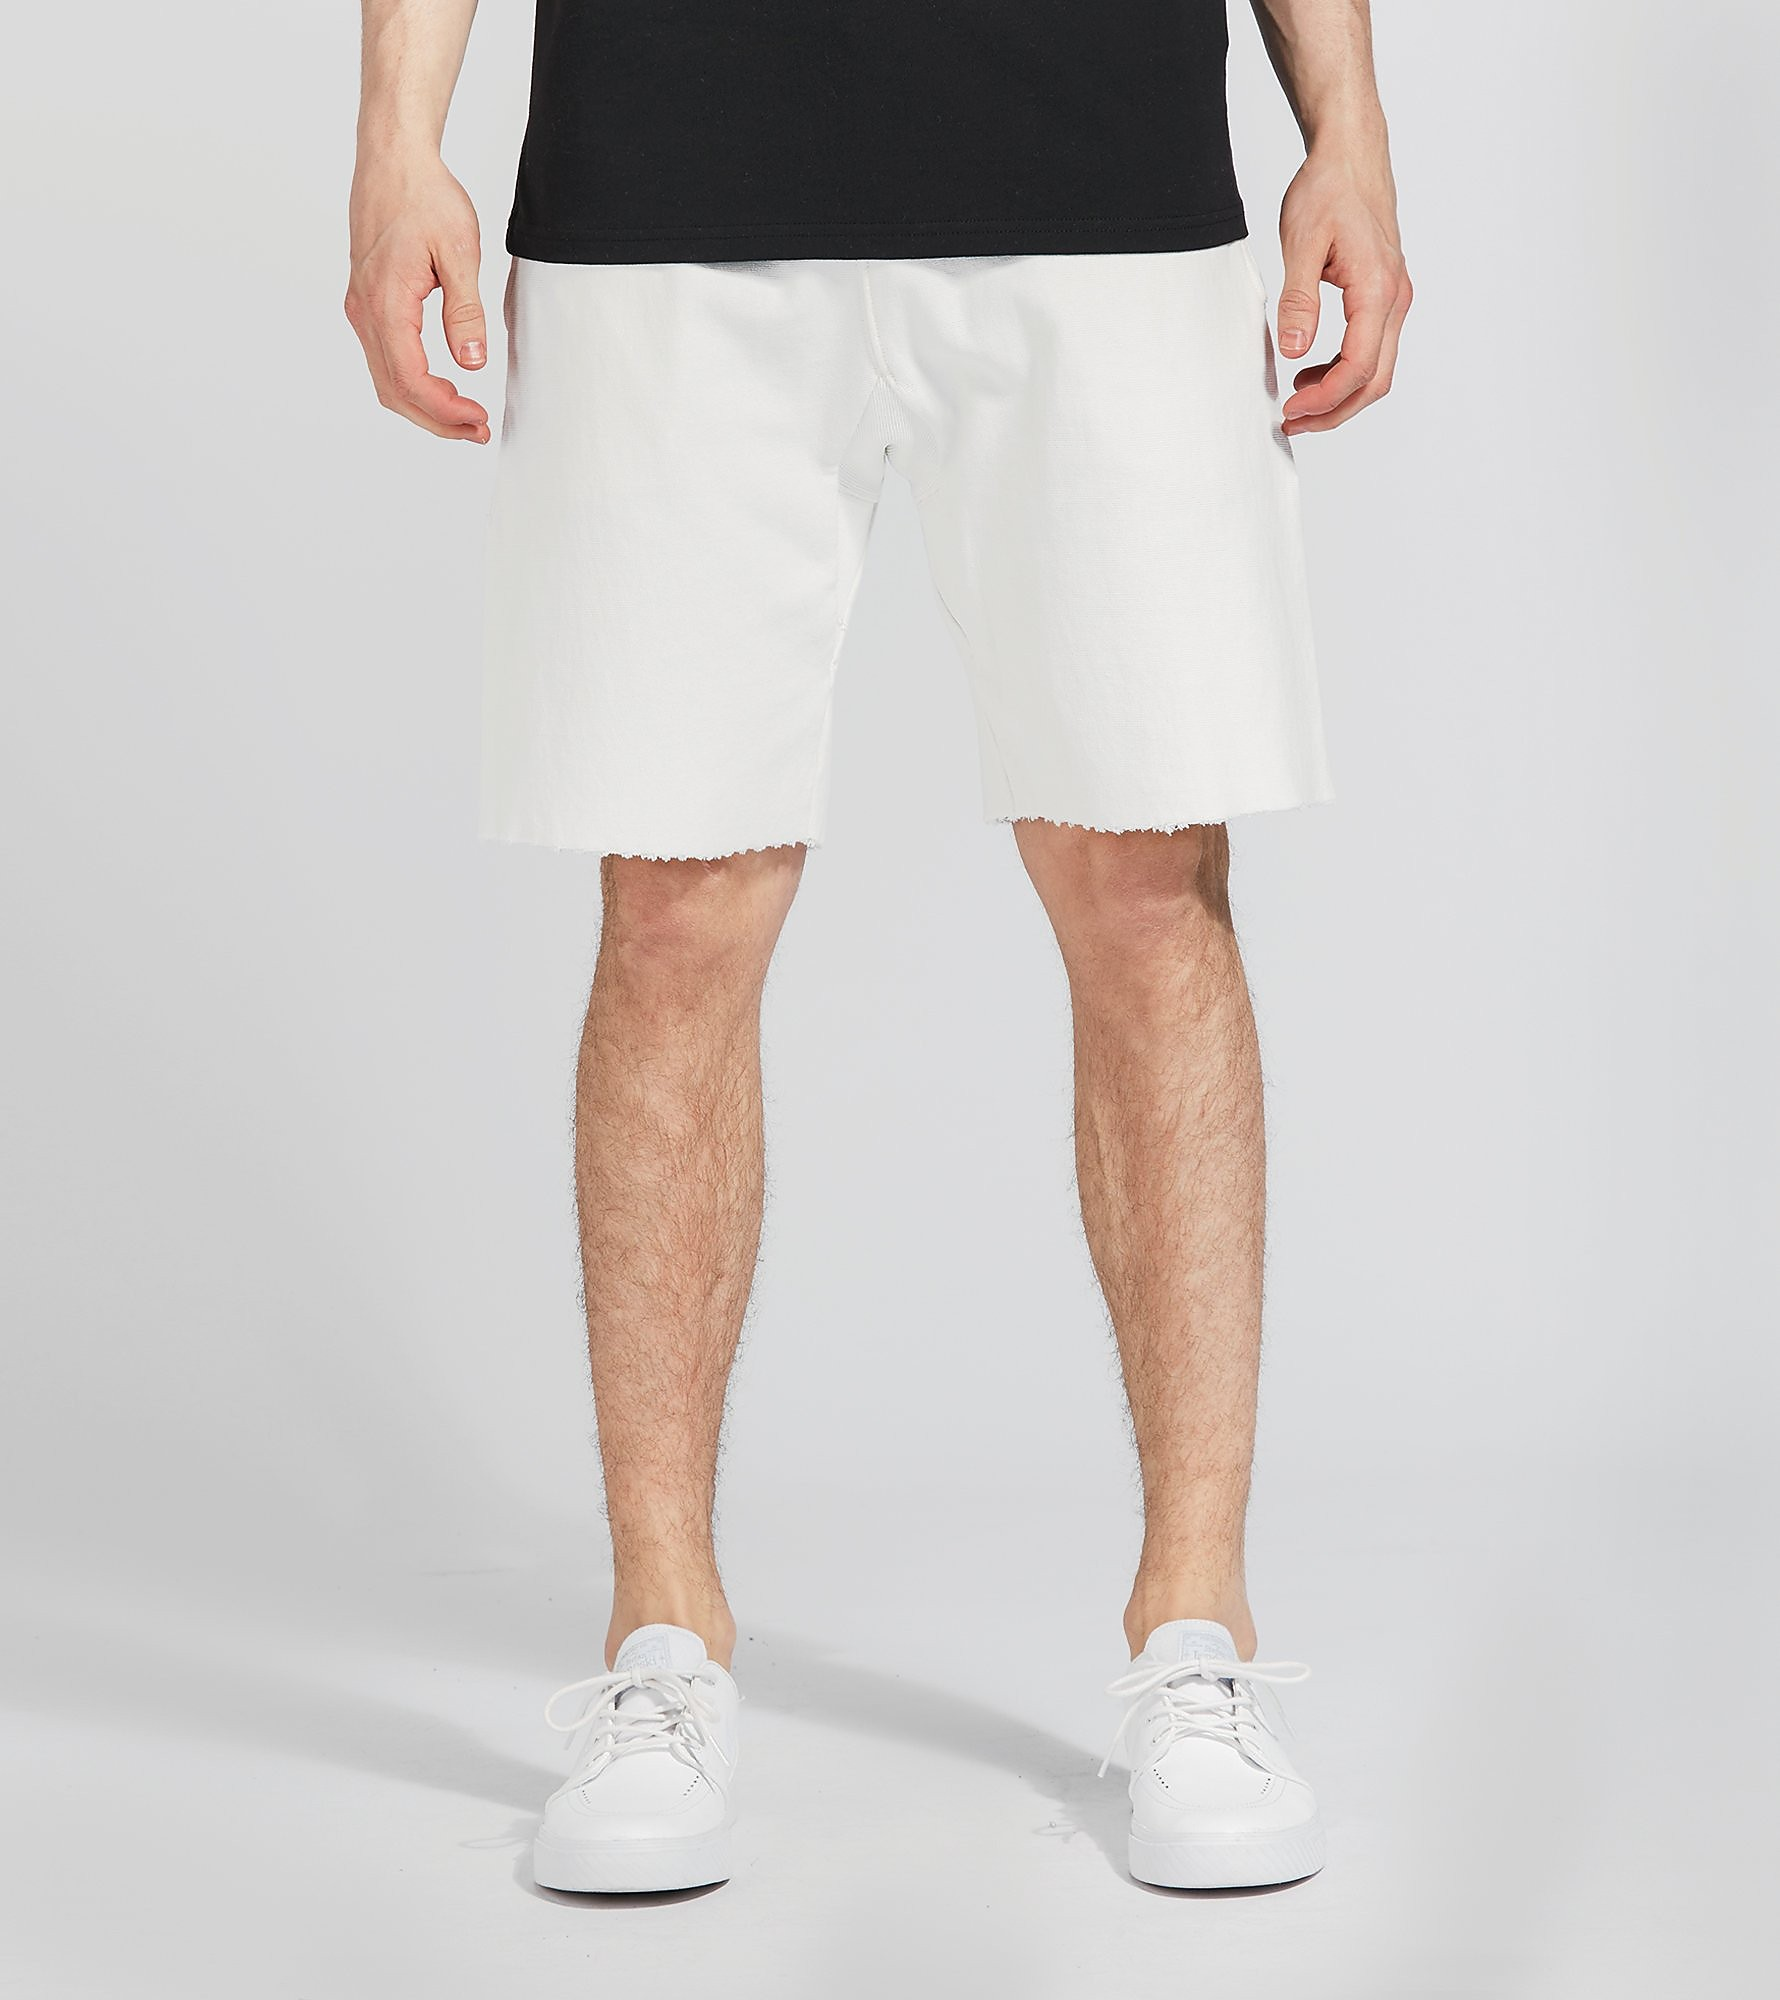 Champion Garment Dyed Shorts